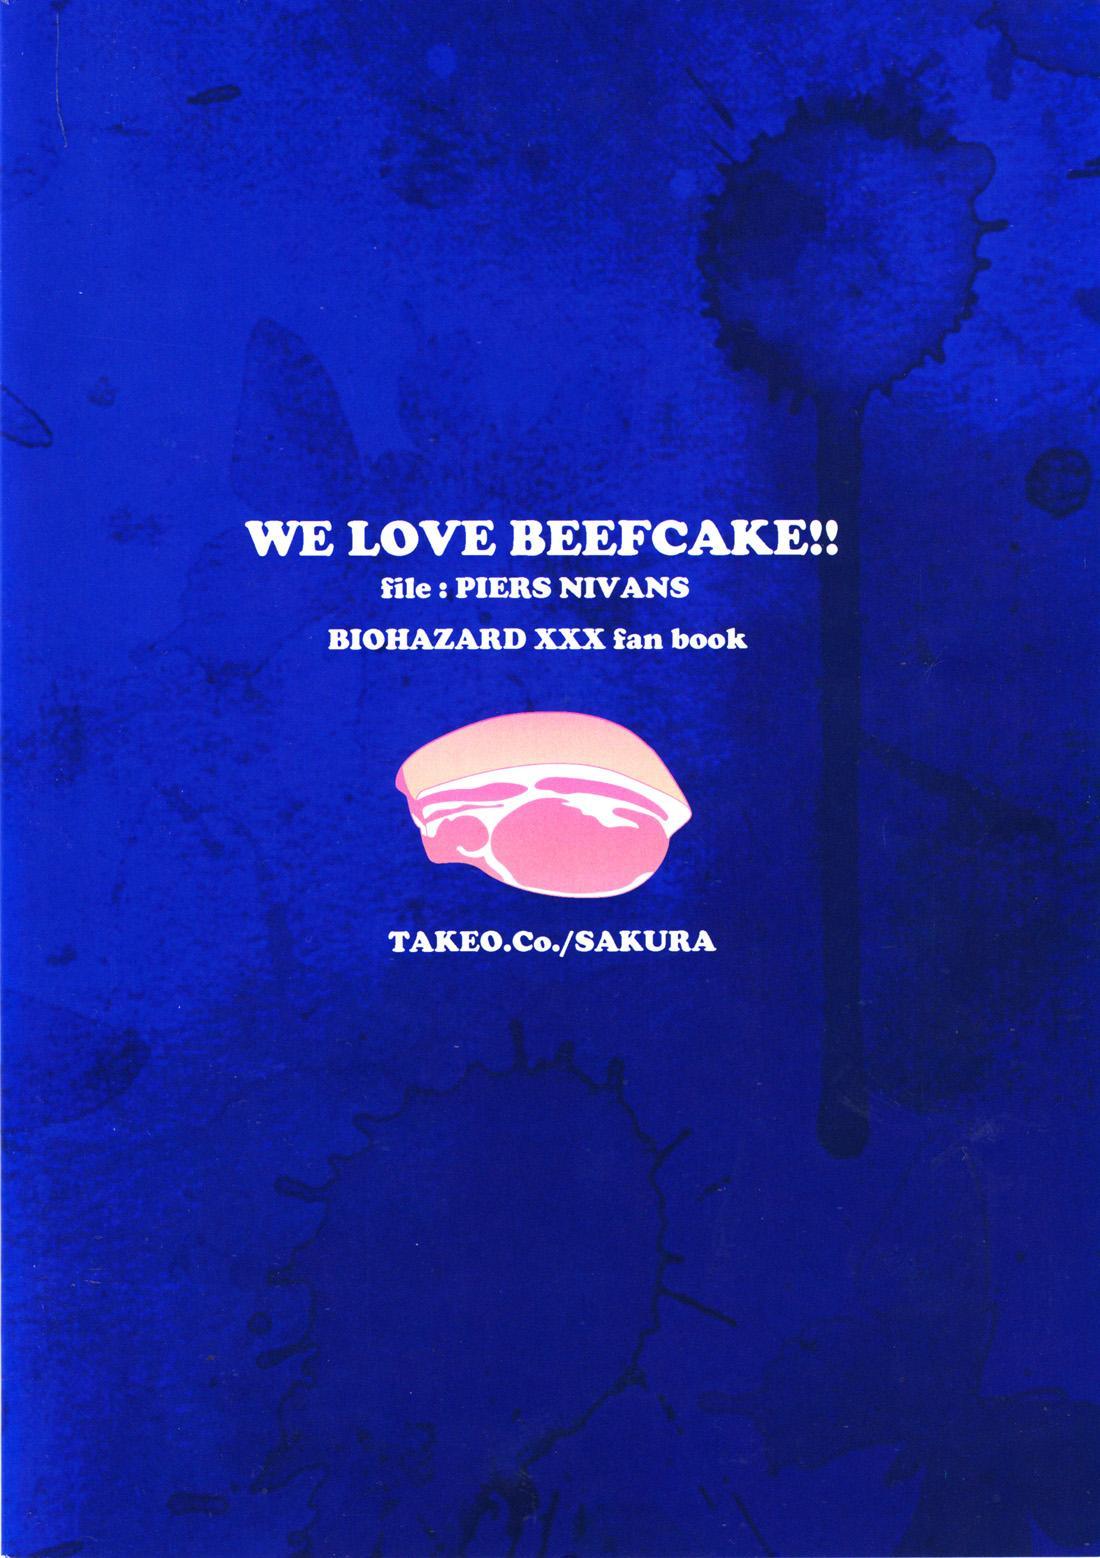 Oinarioimo:We love beefcake 31